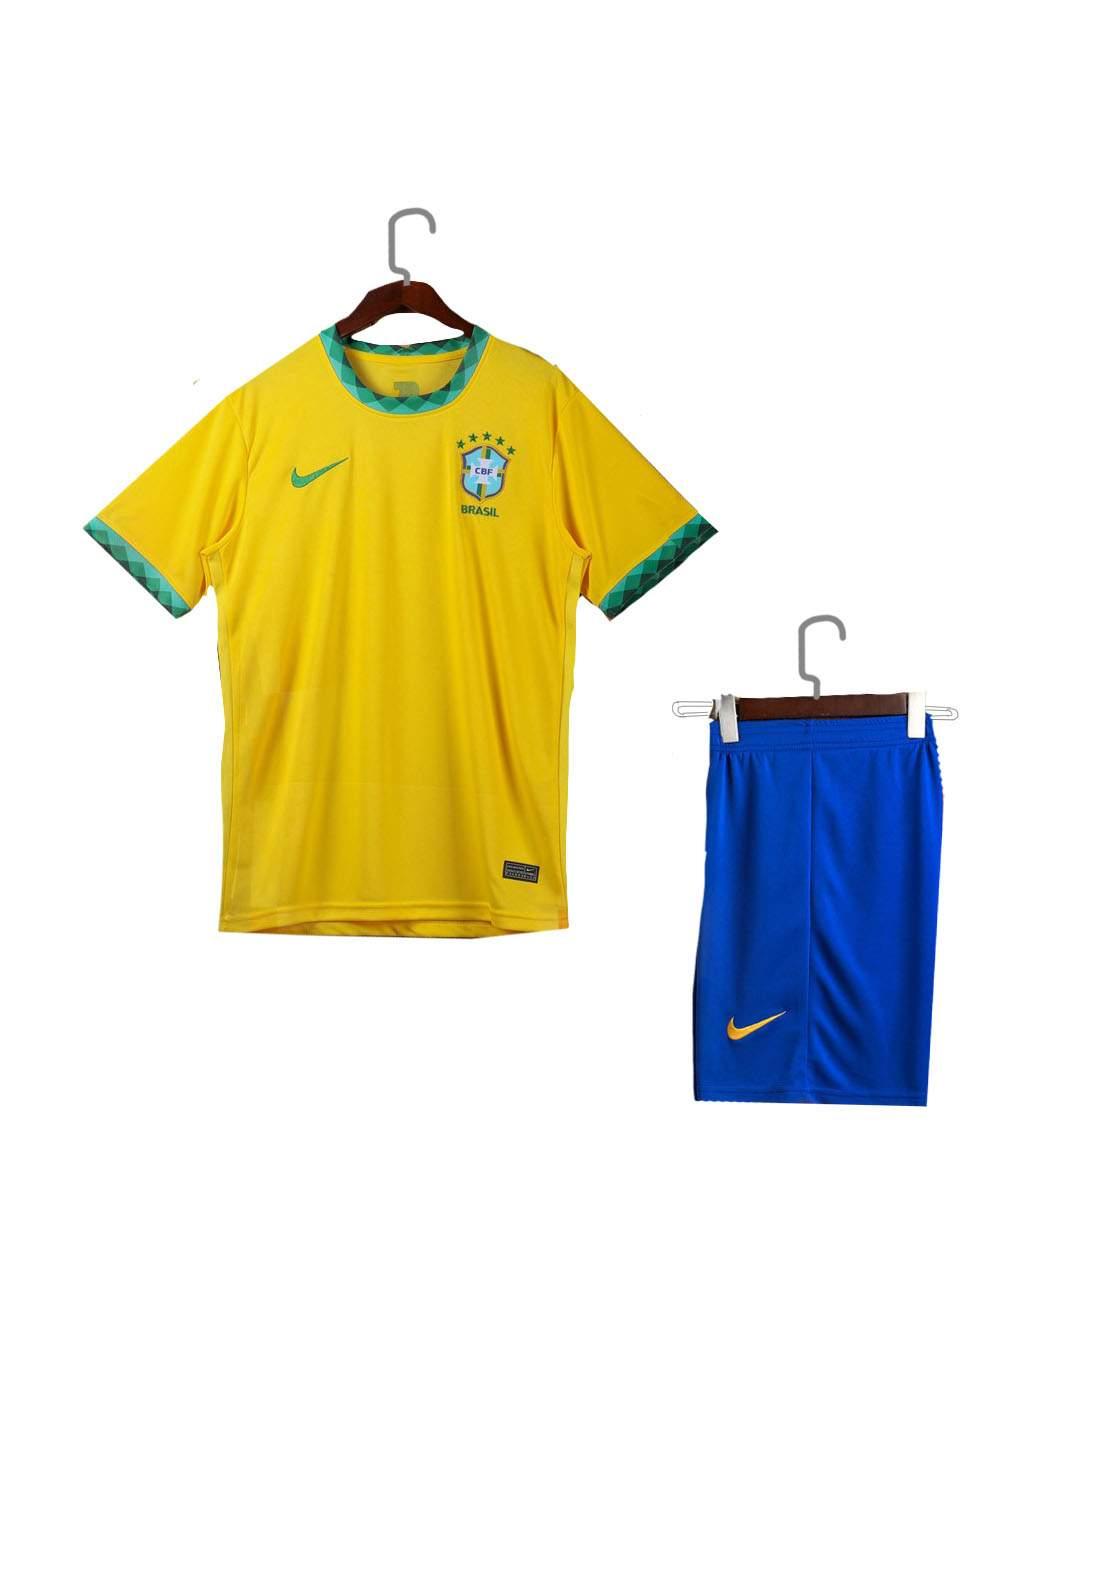 دريس رياضي رجالي Brazil اصفر اللون